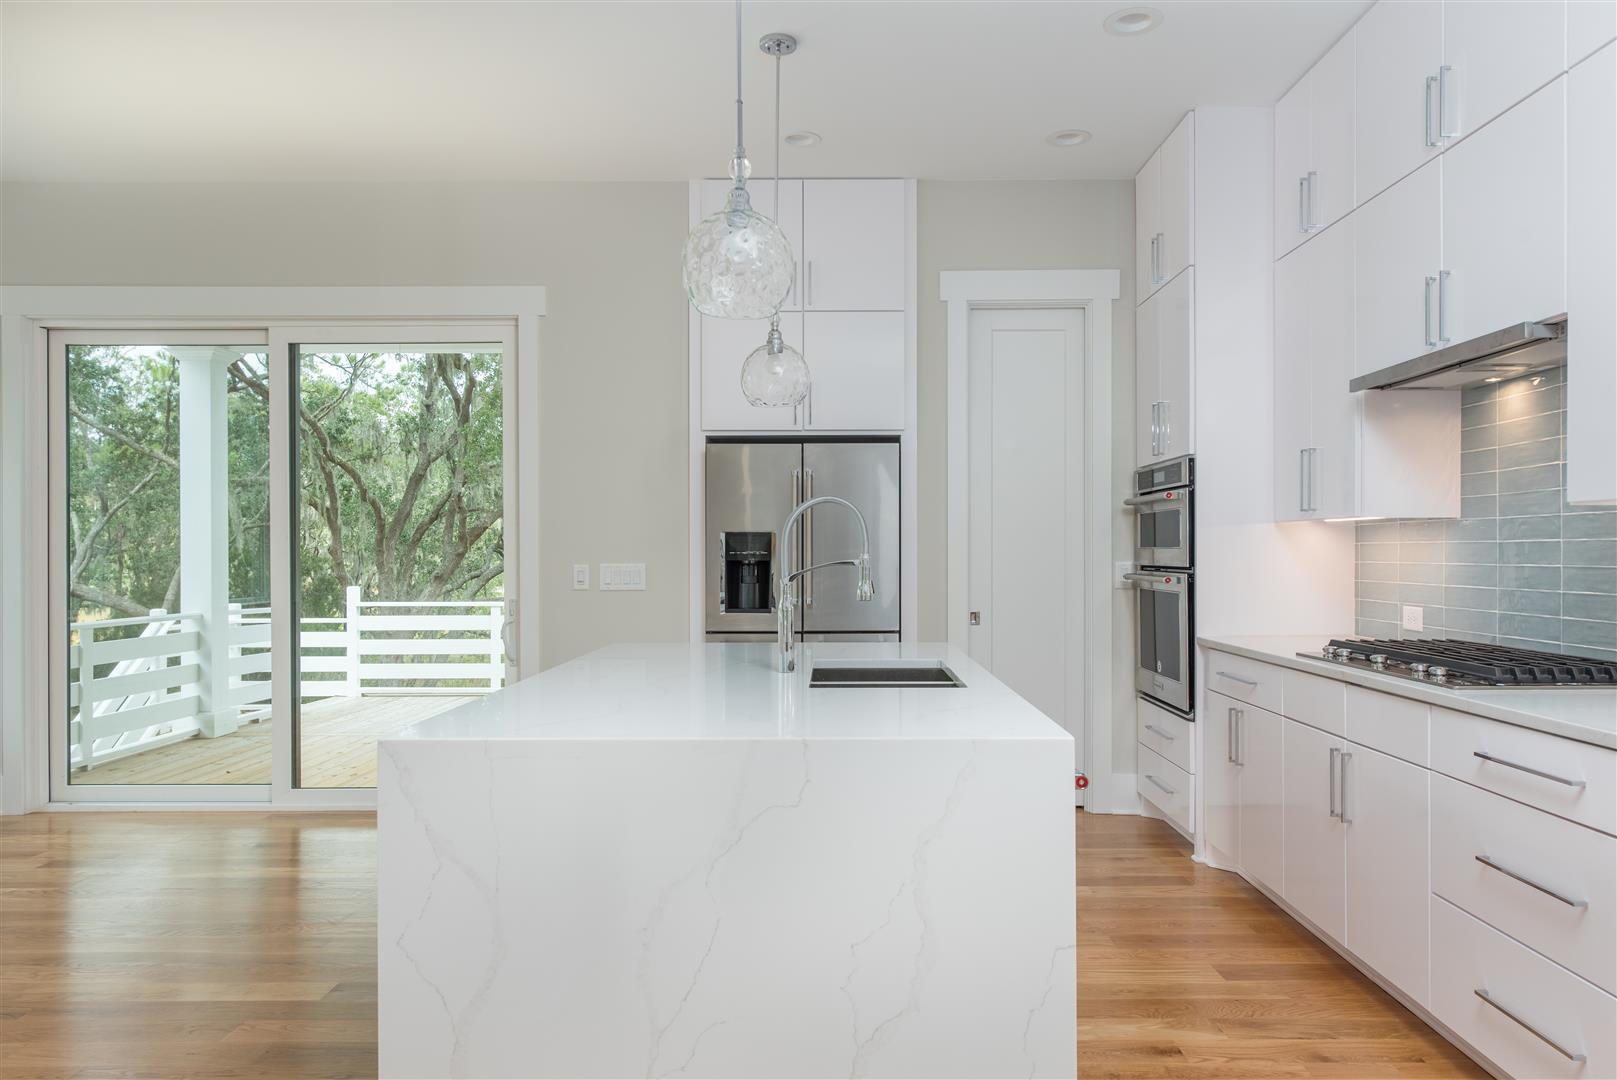 Scanlonville Homes For Sale - 160 5th, Mount Pleasant, SC - 4